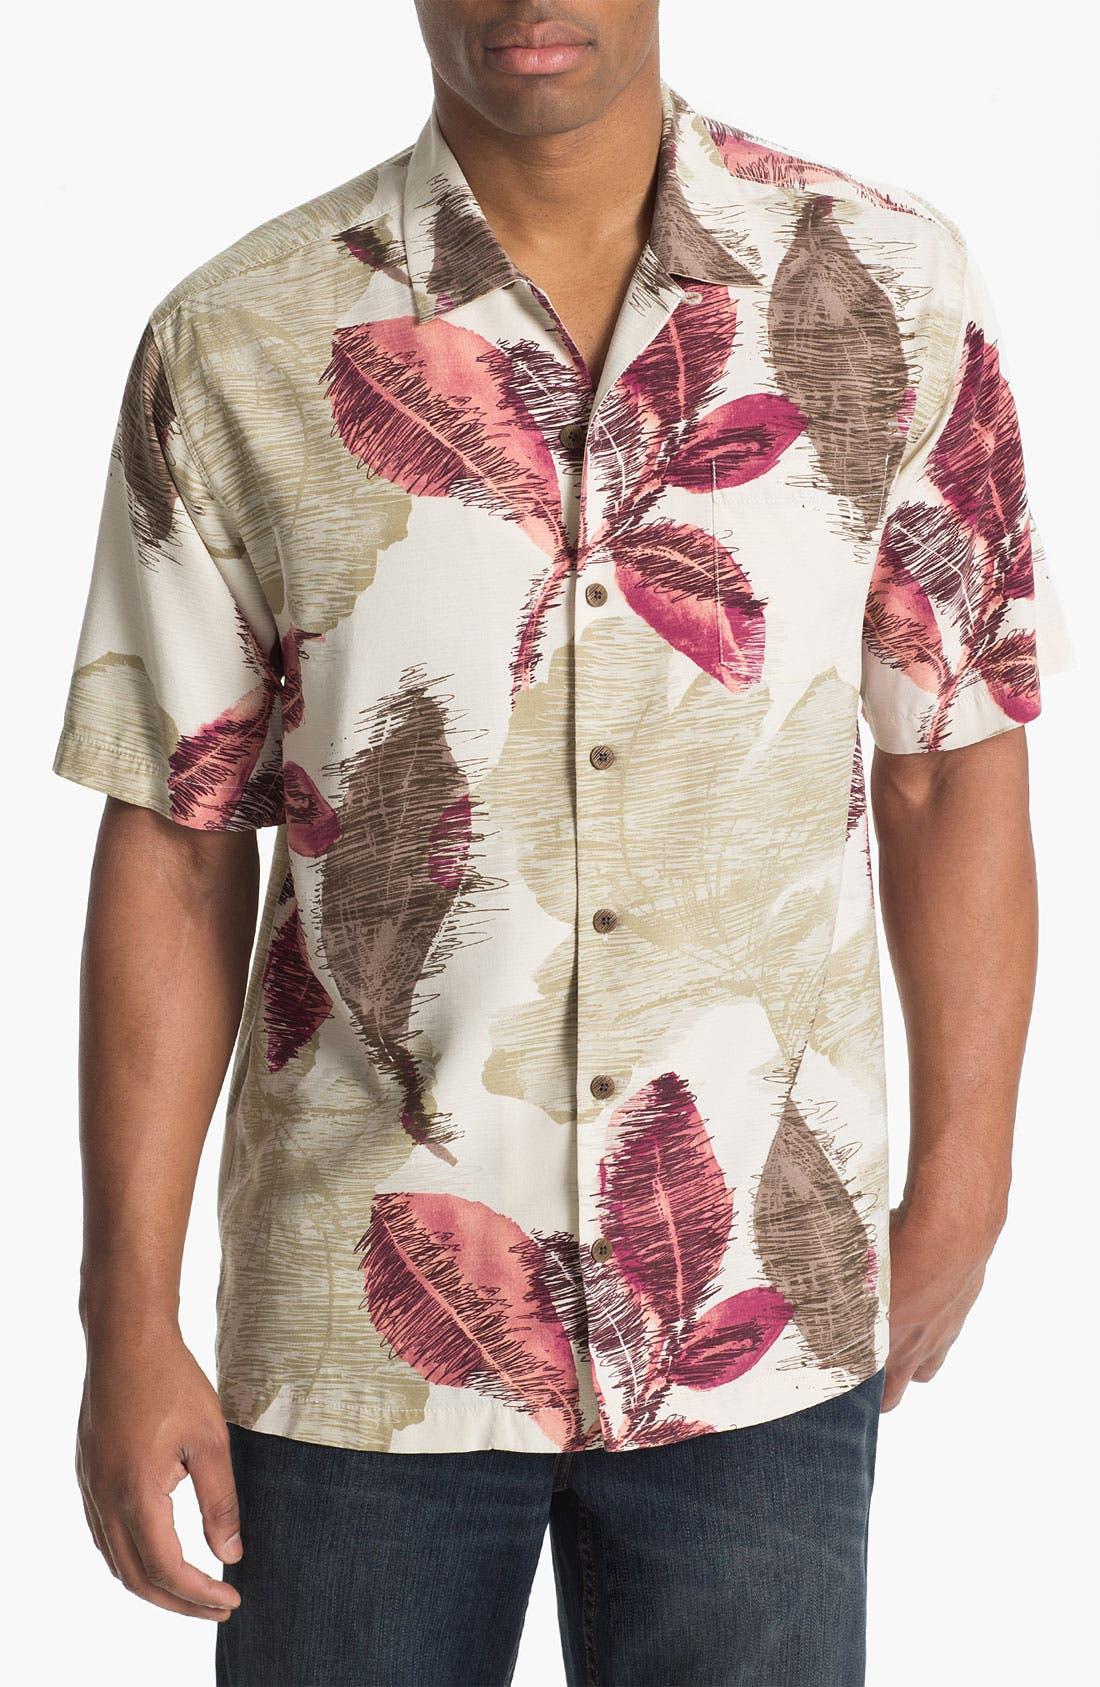 Alternate Image 1 Selected - Tommy Bahama 'Avant Garden' Campshirt